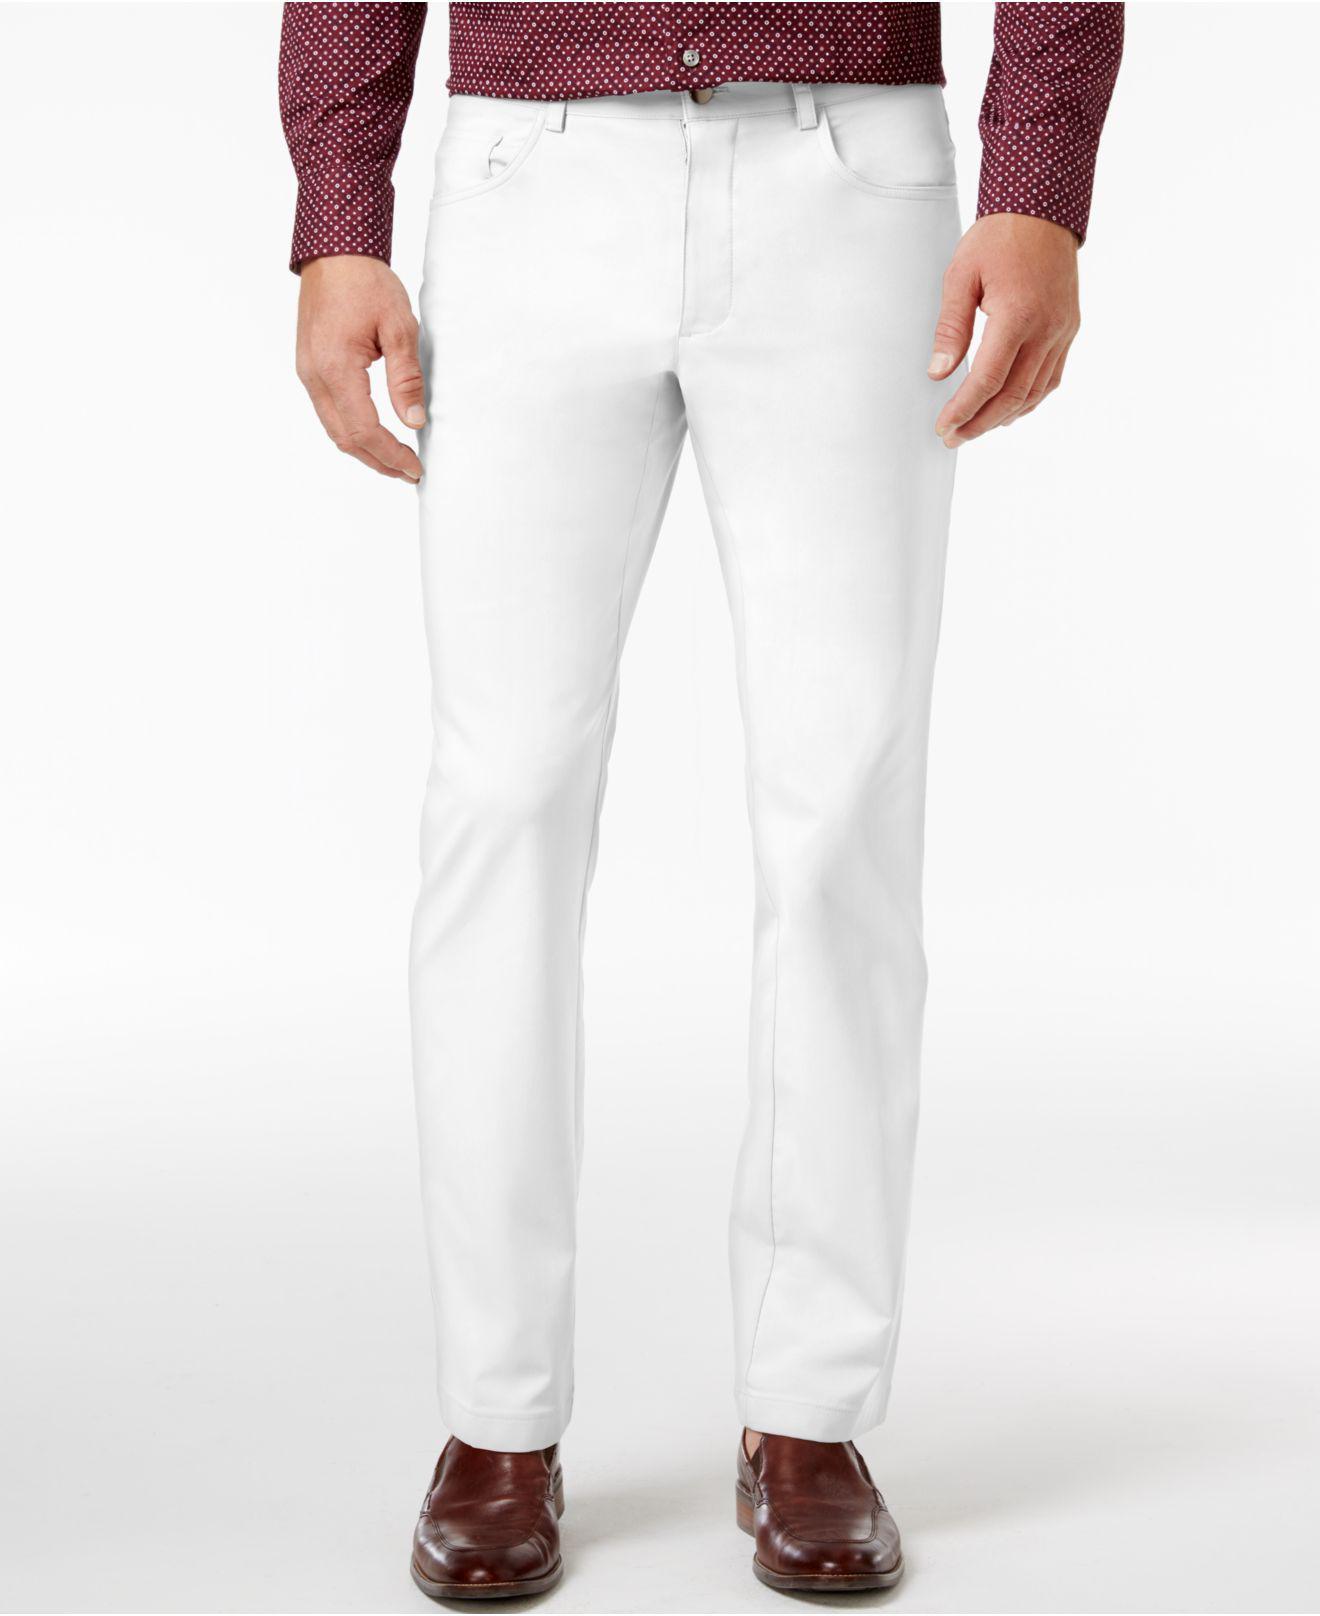 f2ccbe793637 Lyst - Inc International Concepts Men s Slim-fit White Stretch ...